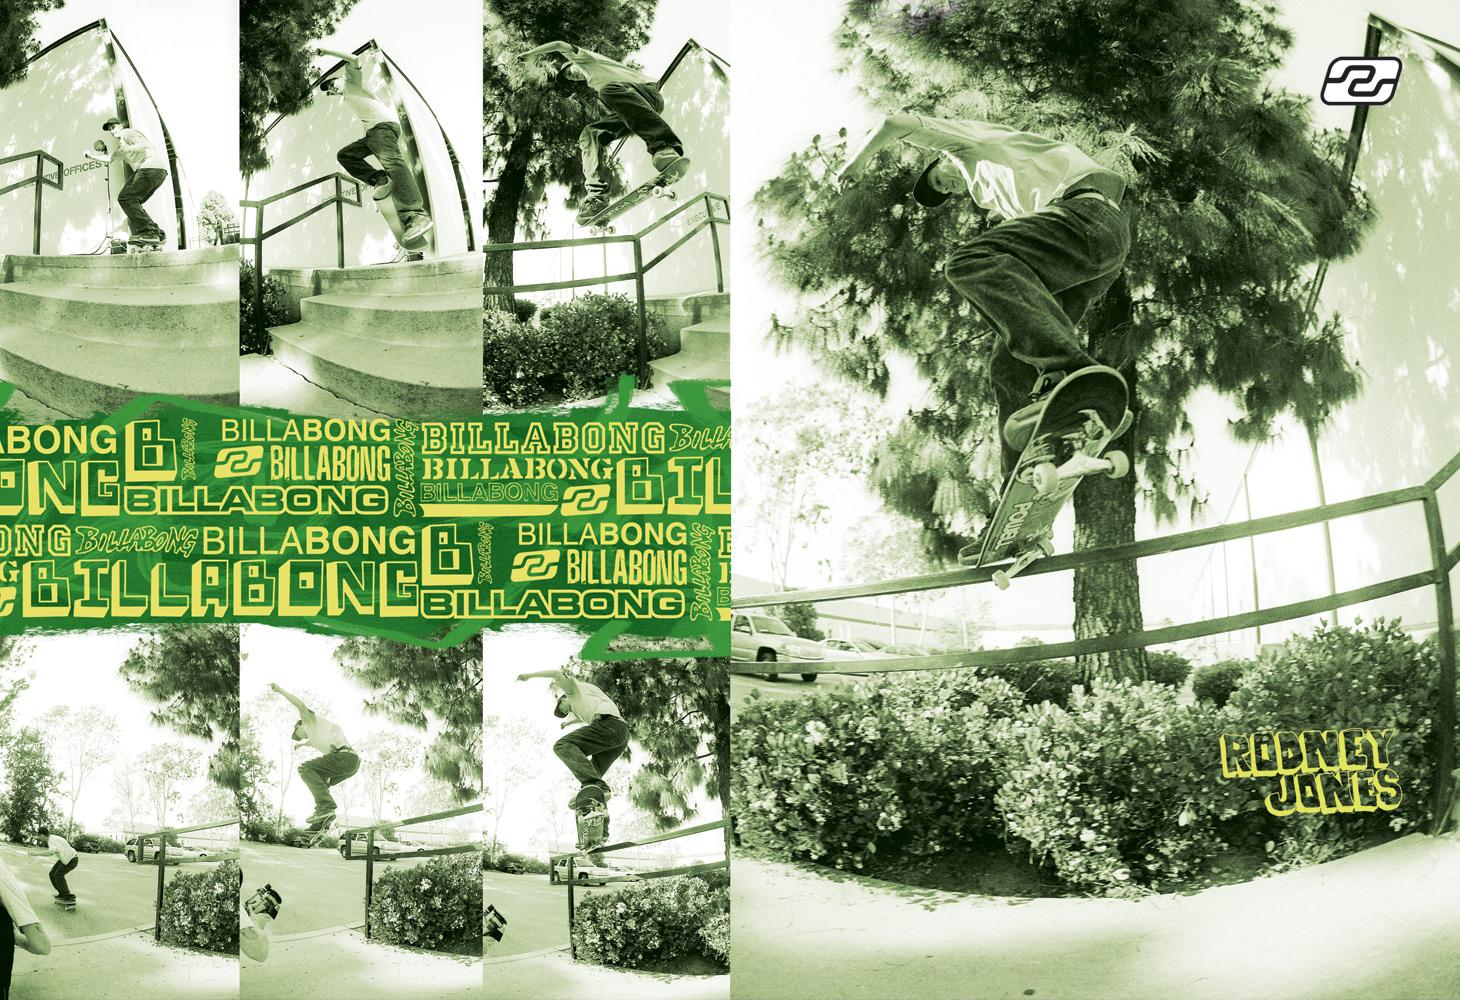 jones_ad_skateboarder